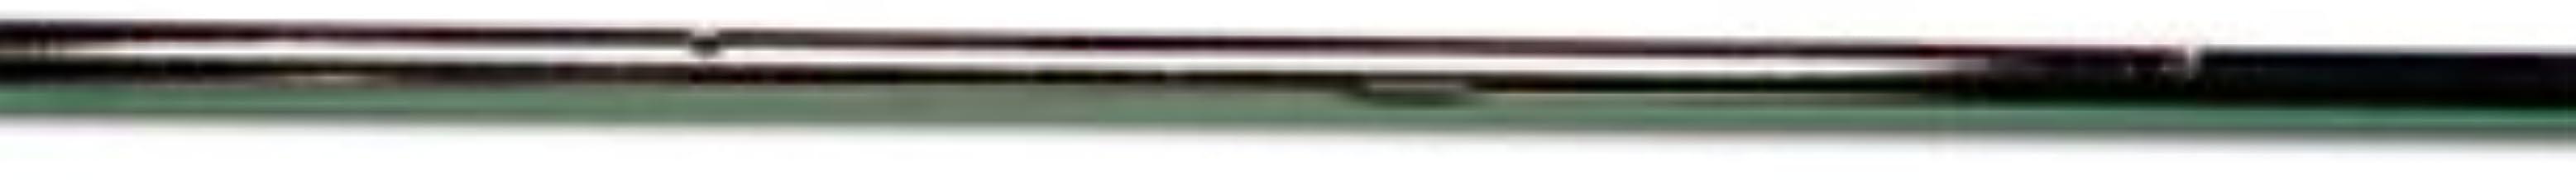 Barra futbolin catalan//cordoba 14mm 3 agujeros portero//defensa//media 1,33